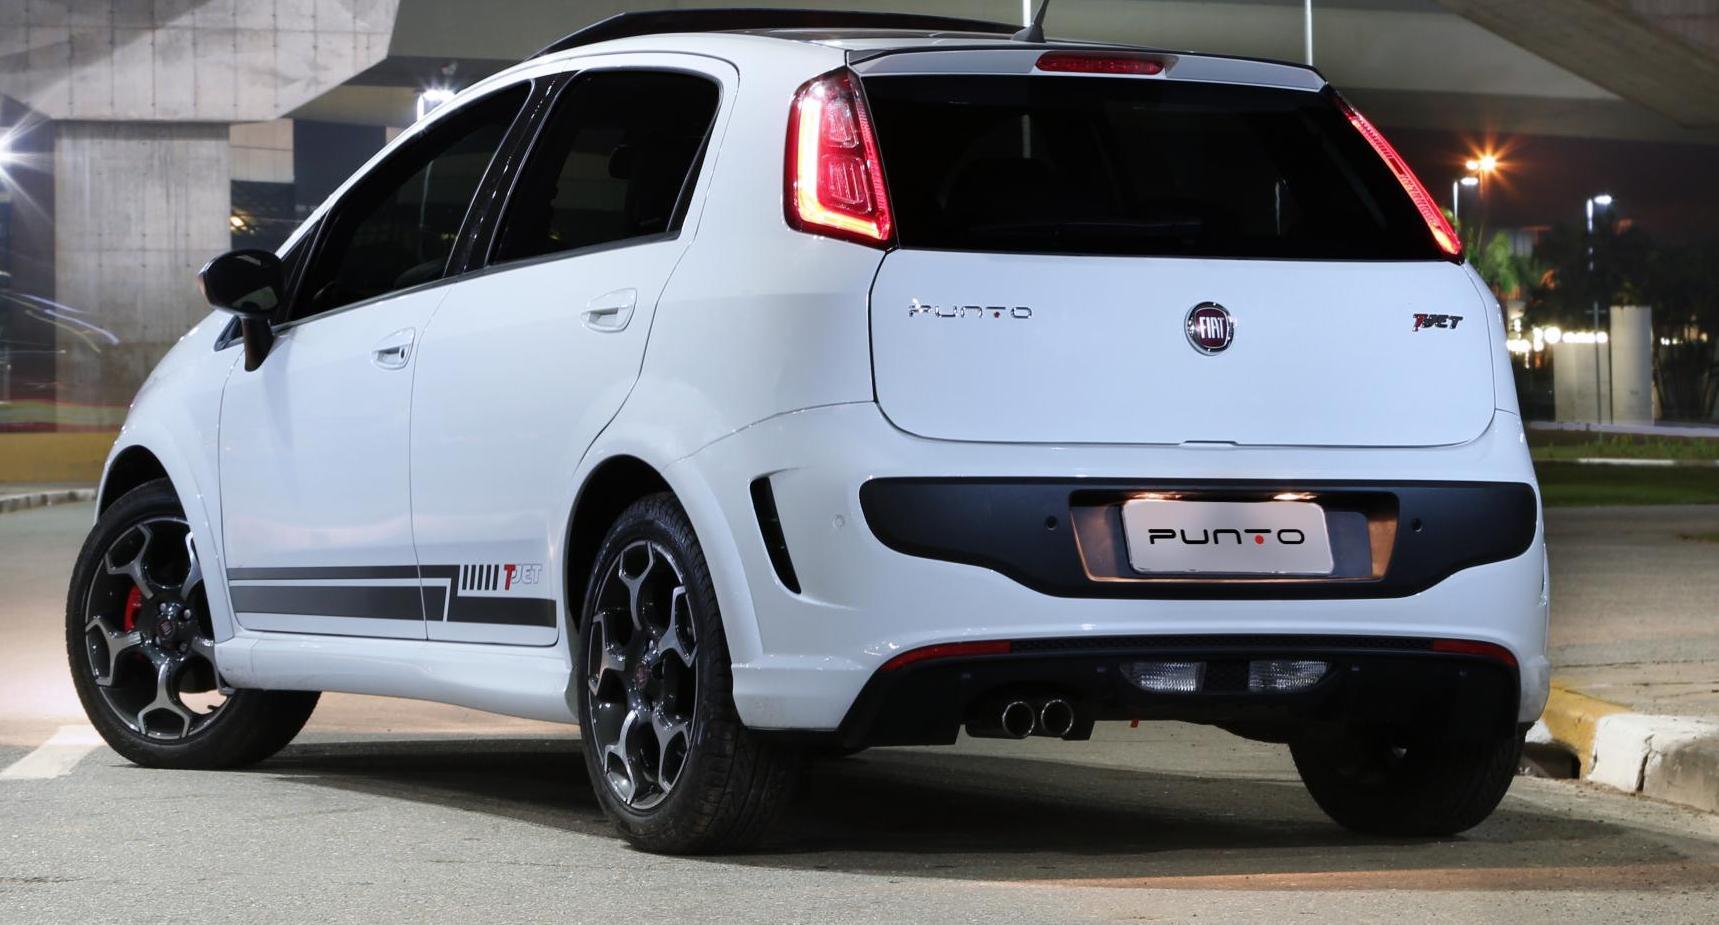 Carros FIAT (Palio, Uno e Punto)